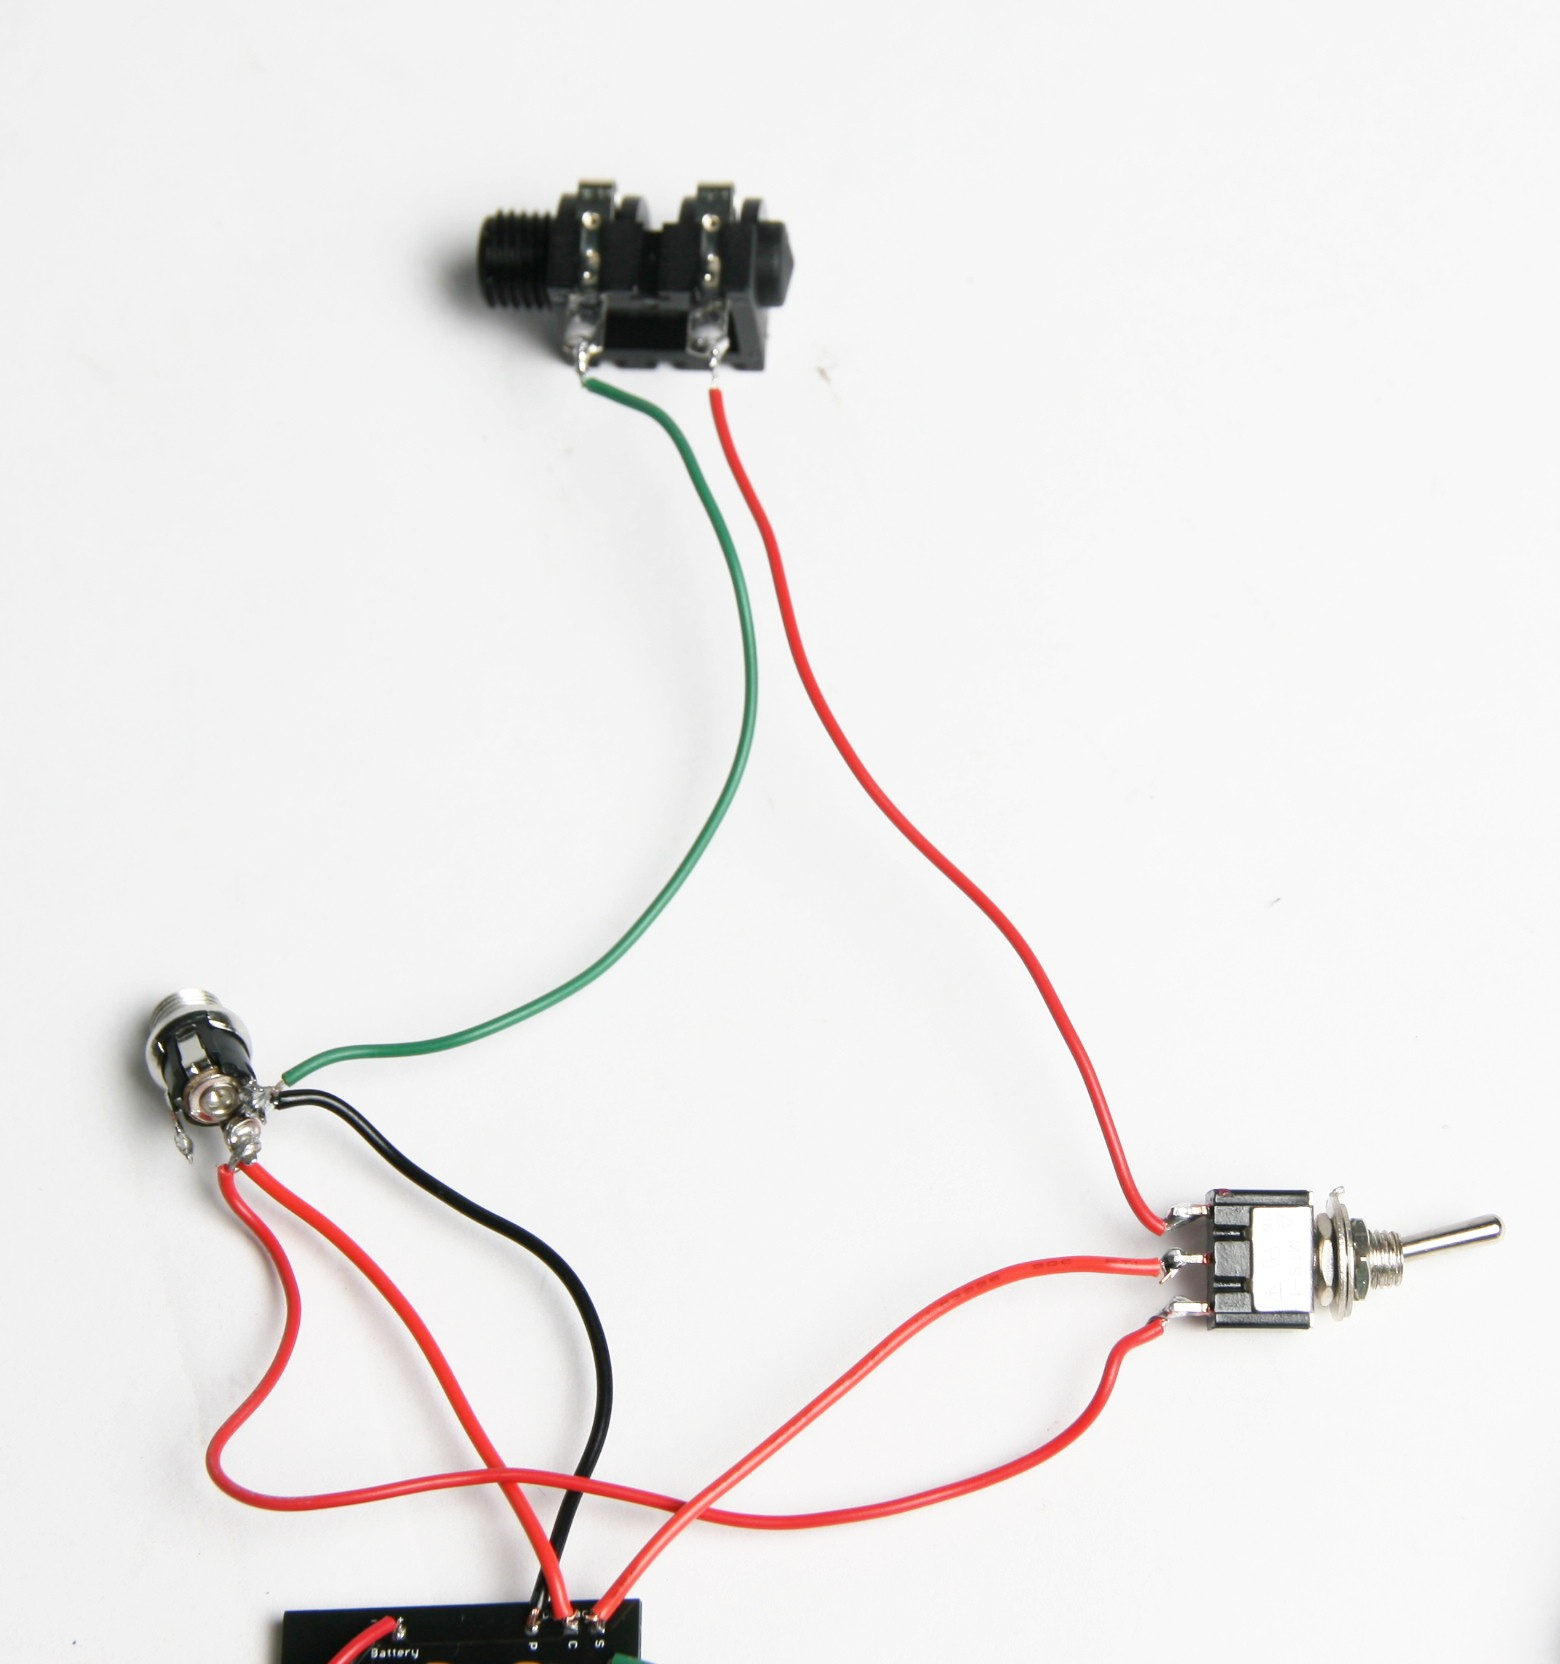 spdt switch wiring diagram vdsl 3pdt a b free engine image for user manual